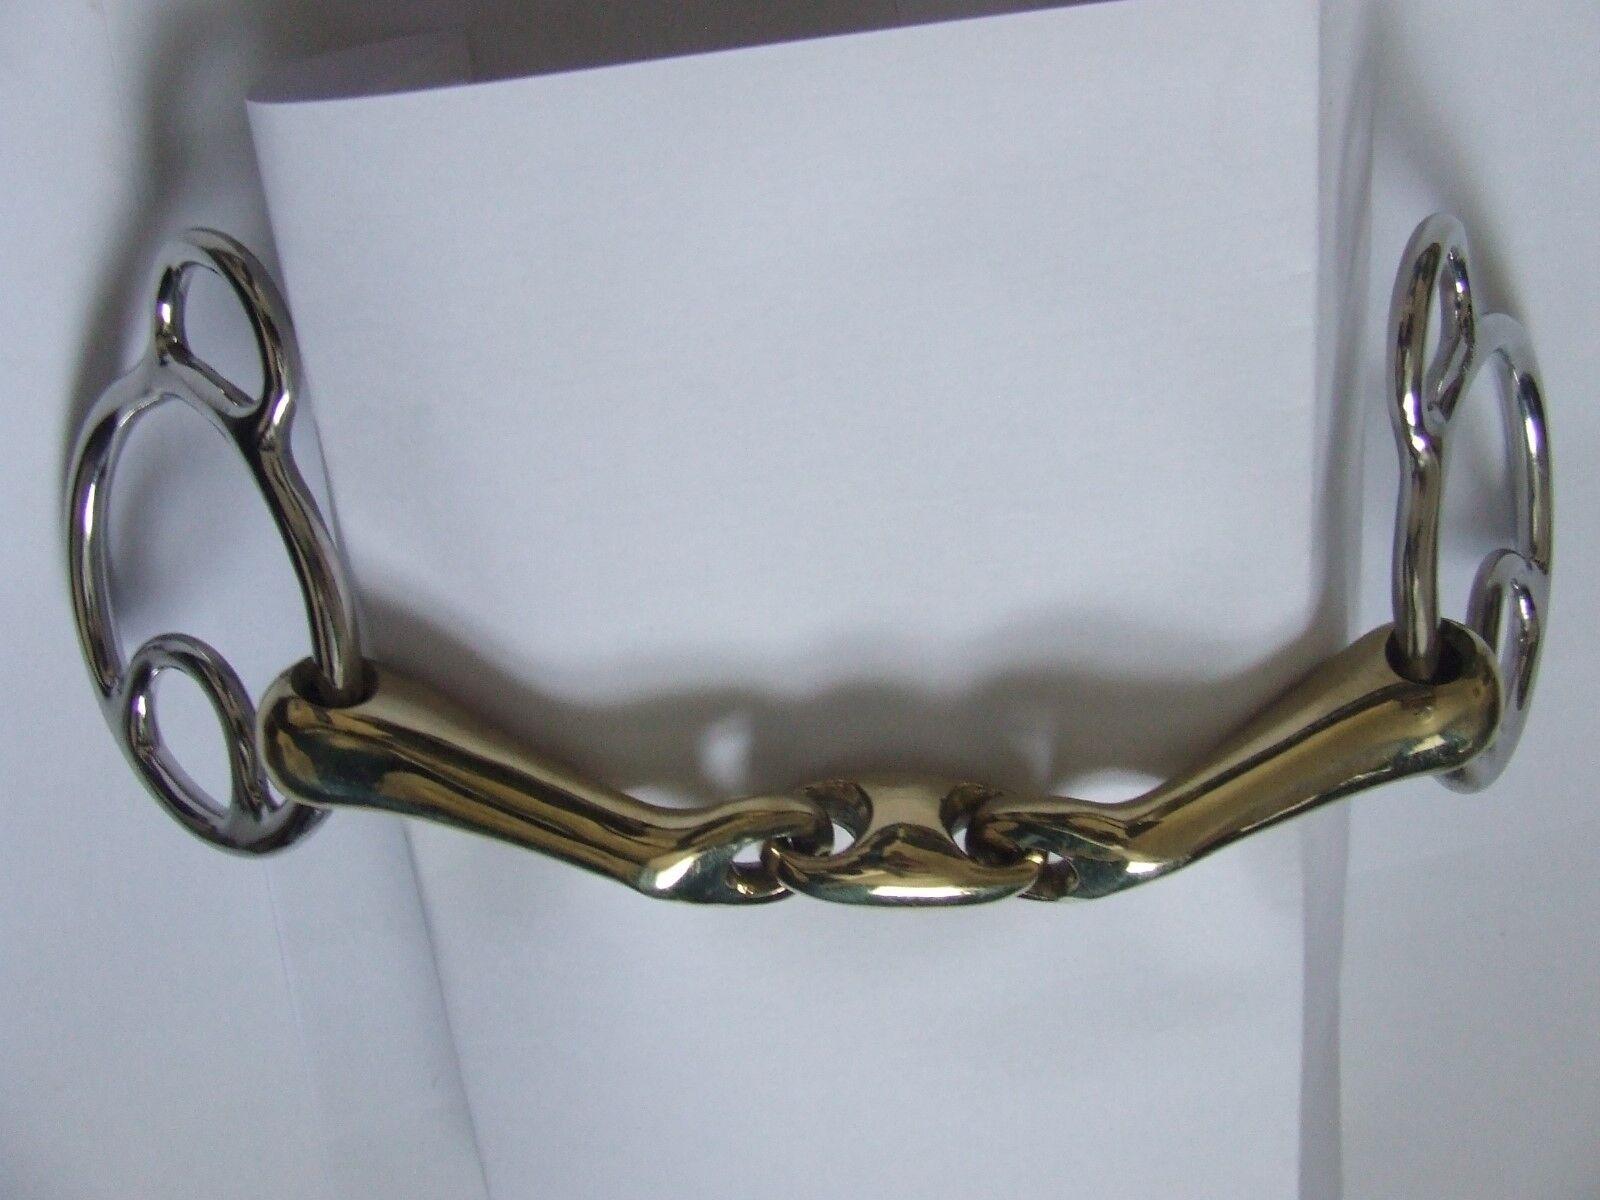 Angled Mouthpiece Brass with Beval with Brass lozenge Wilkie Bit 5.5